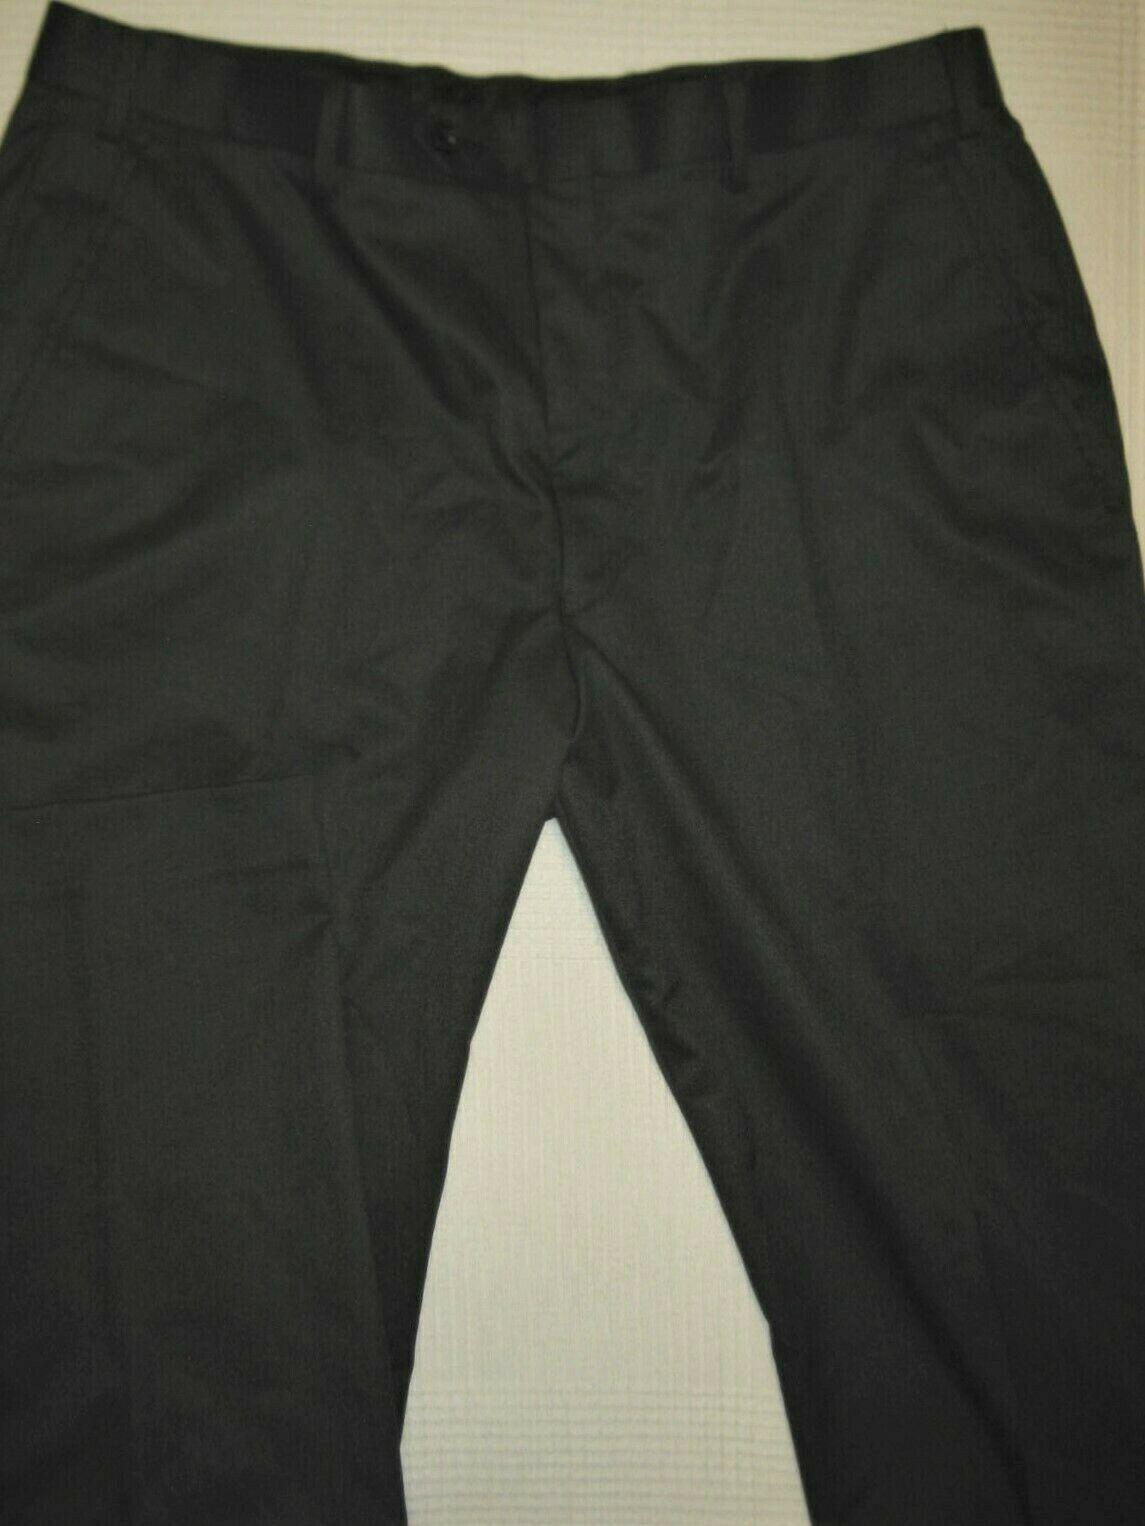 Alfani Mens Grey Flat Front Dress Pants Stretch Regular Fit 36X32